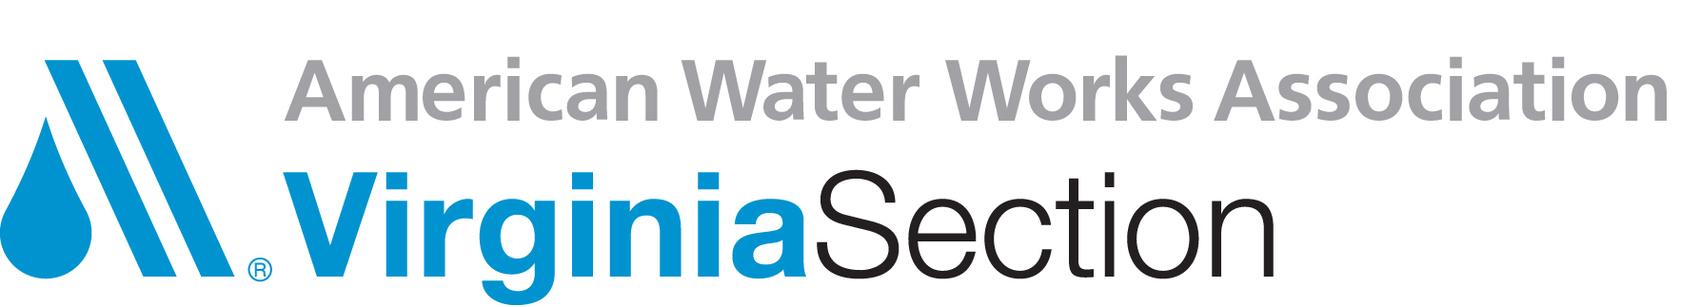 VA AWWA logo